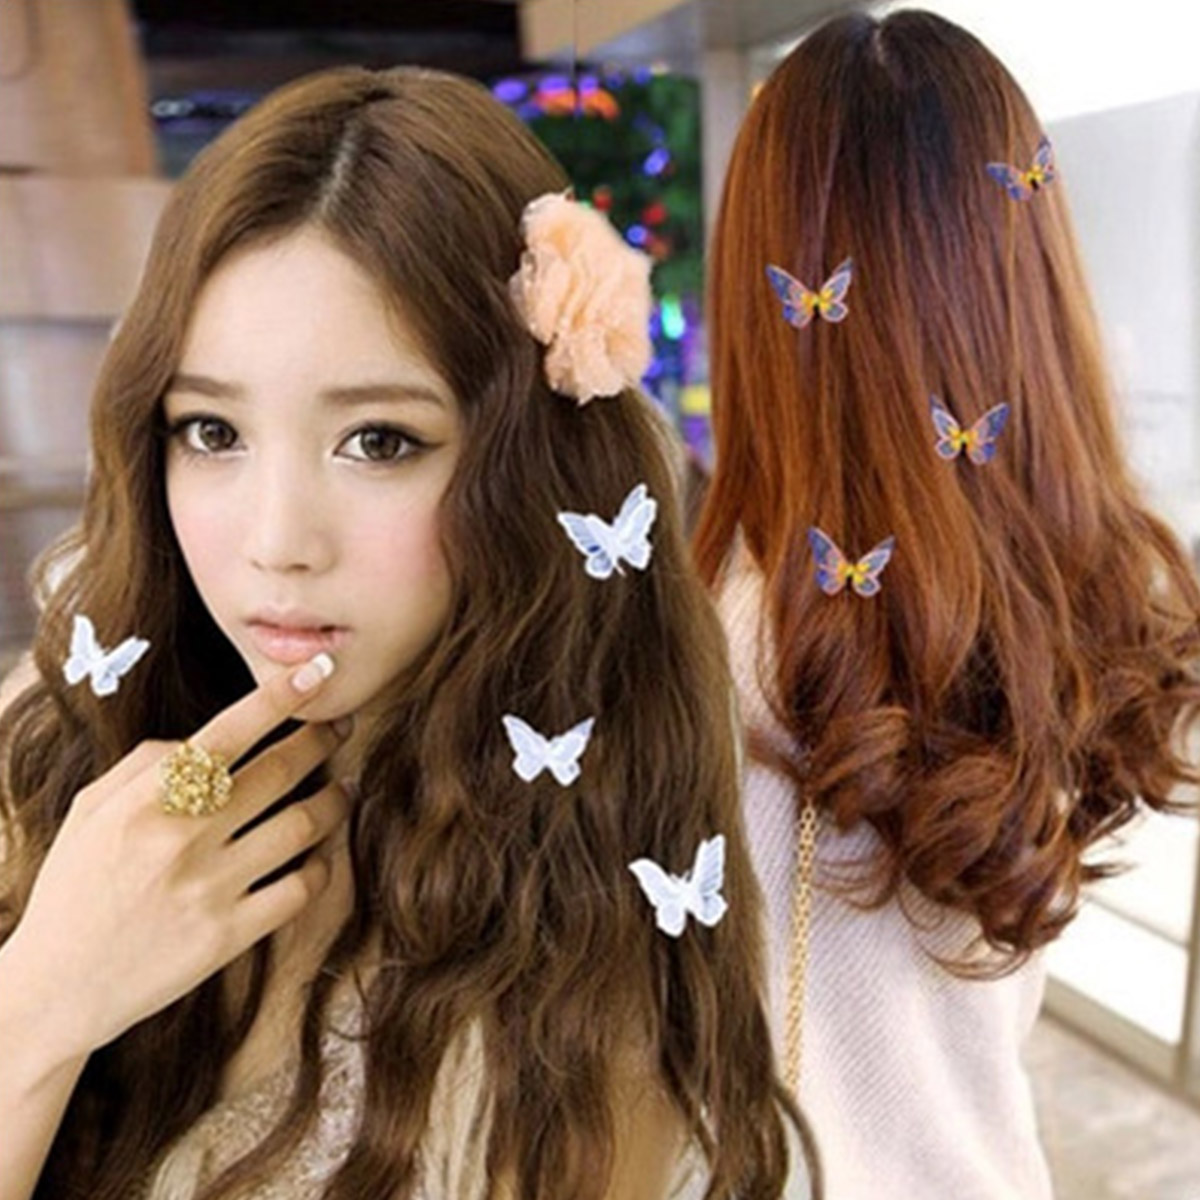 Xugar Hair Accessories 1Pcs Cute Butterfly Hair Clips for Women Girls Embroidery Metal Hairpins Sweet Bride Wedding Headwear in Women 39 s Hair Accessories from Apparel Accessories